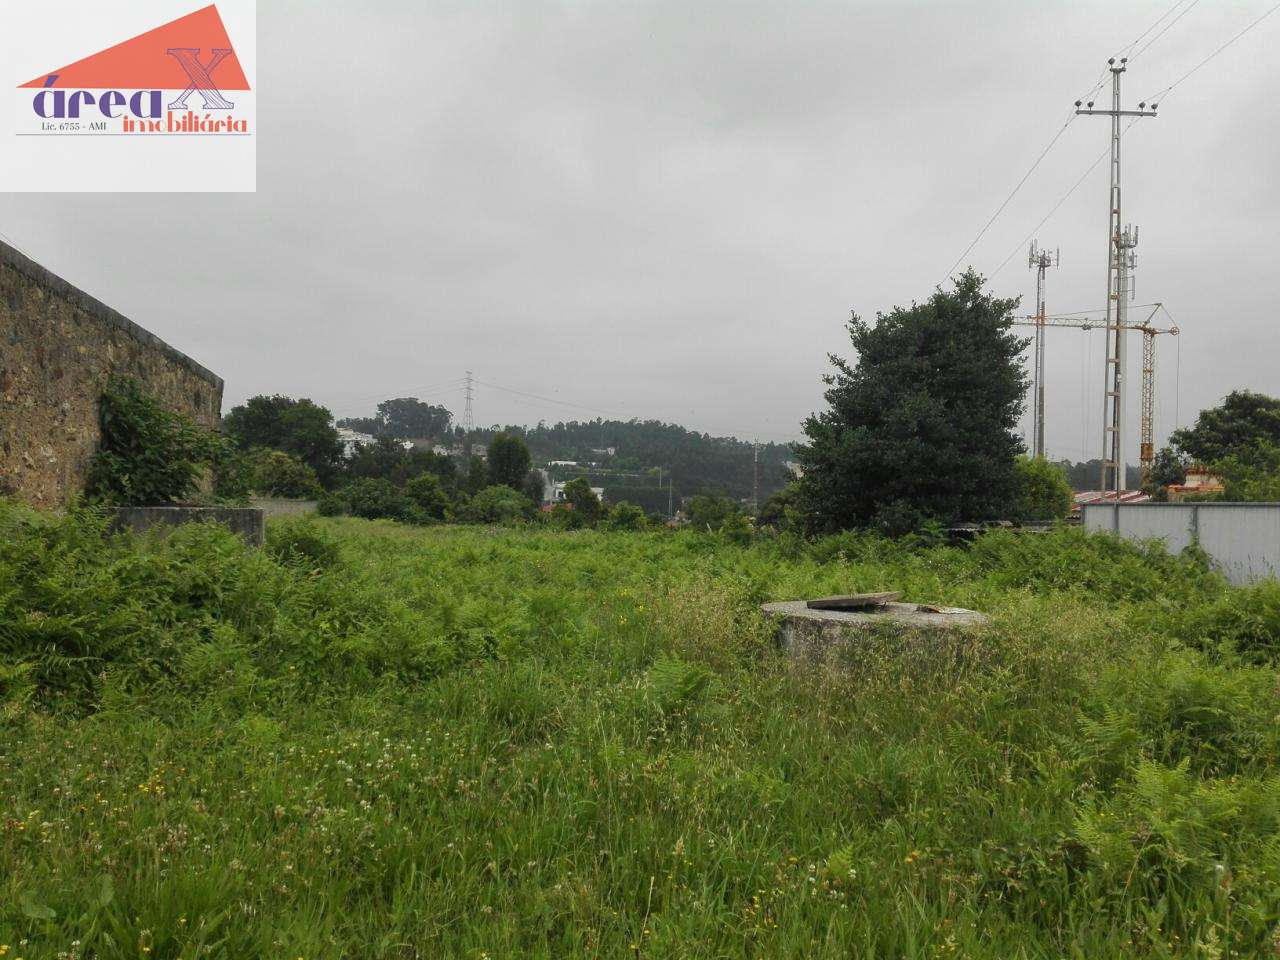 Terreno para comprar, Vila de Cucujães, Aveiro - Foto 4